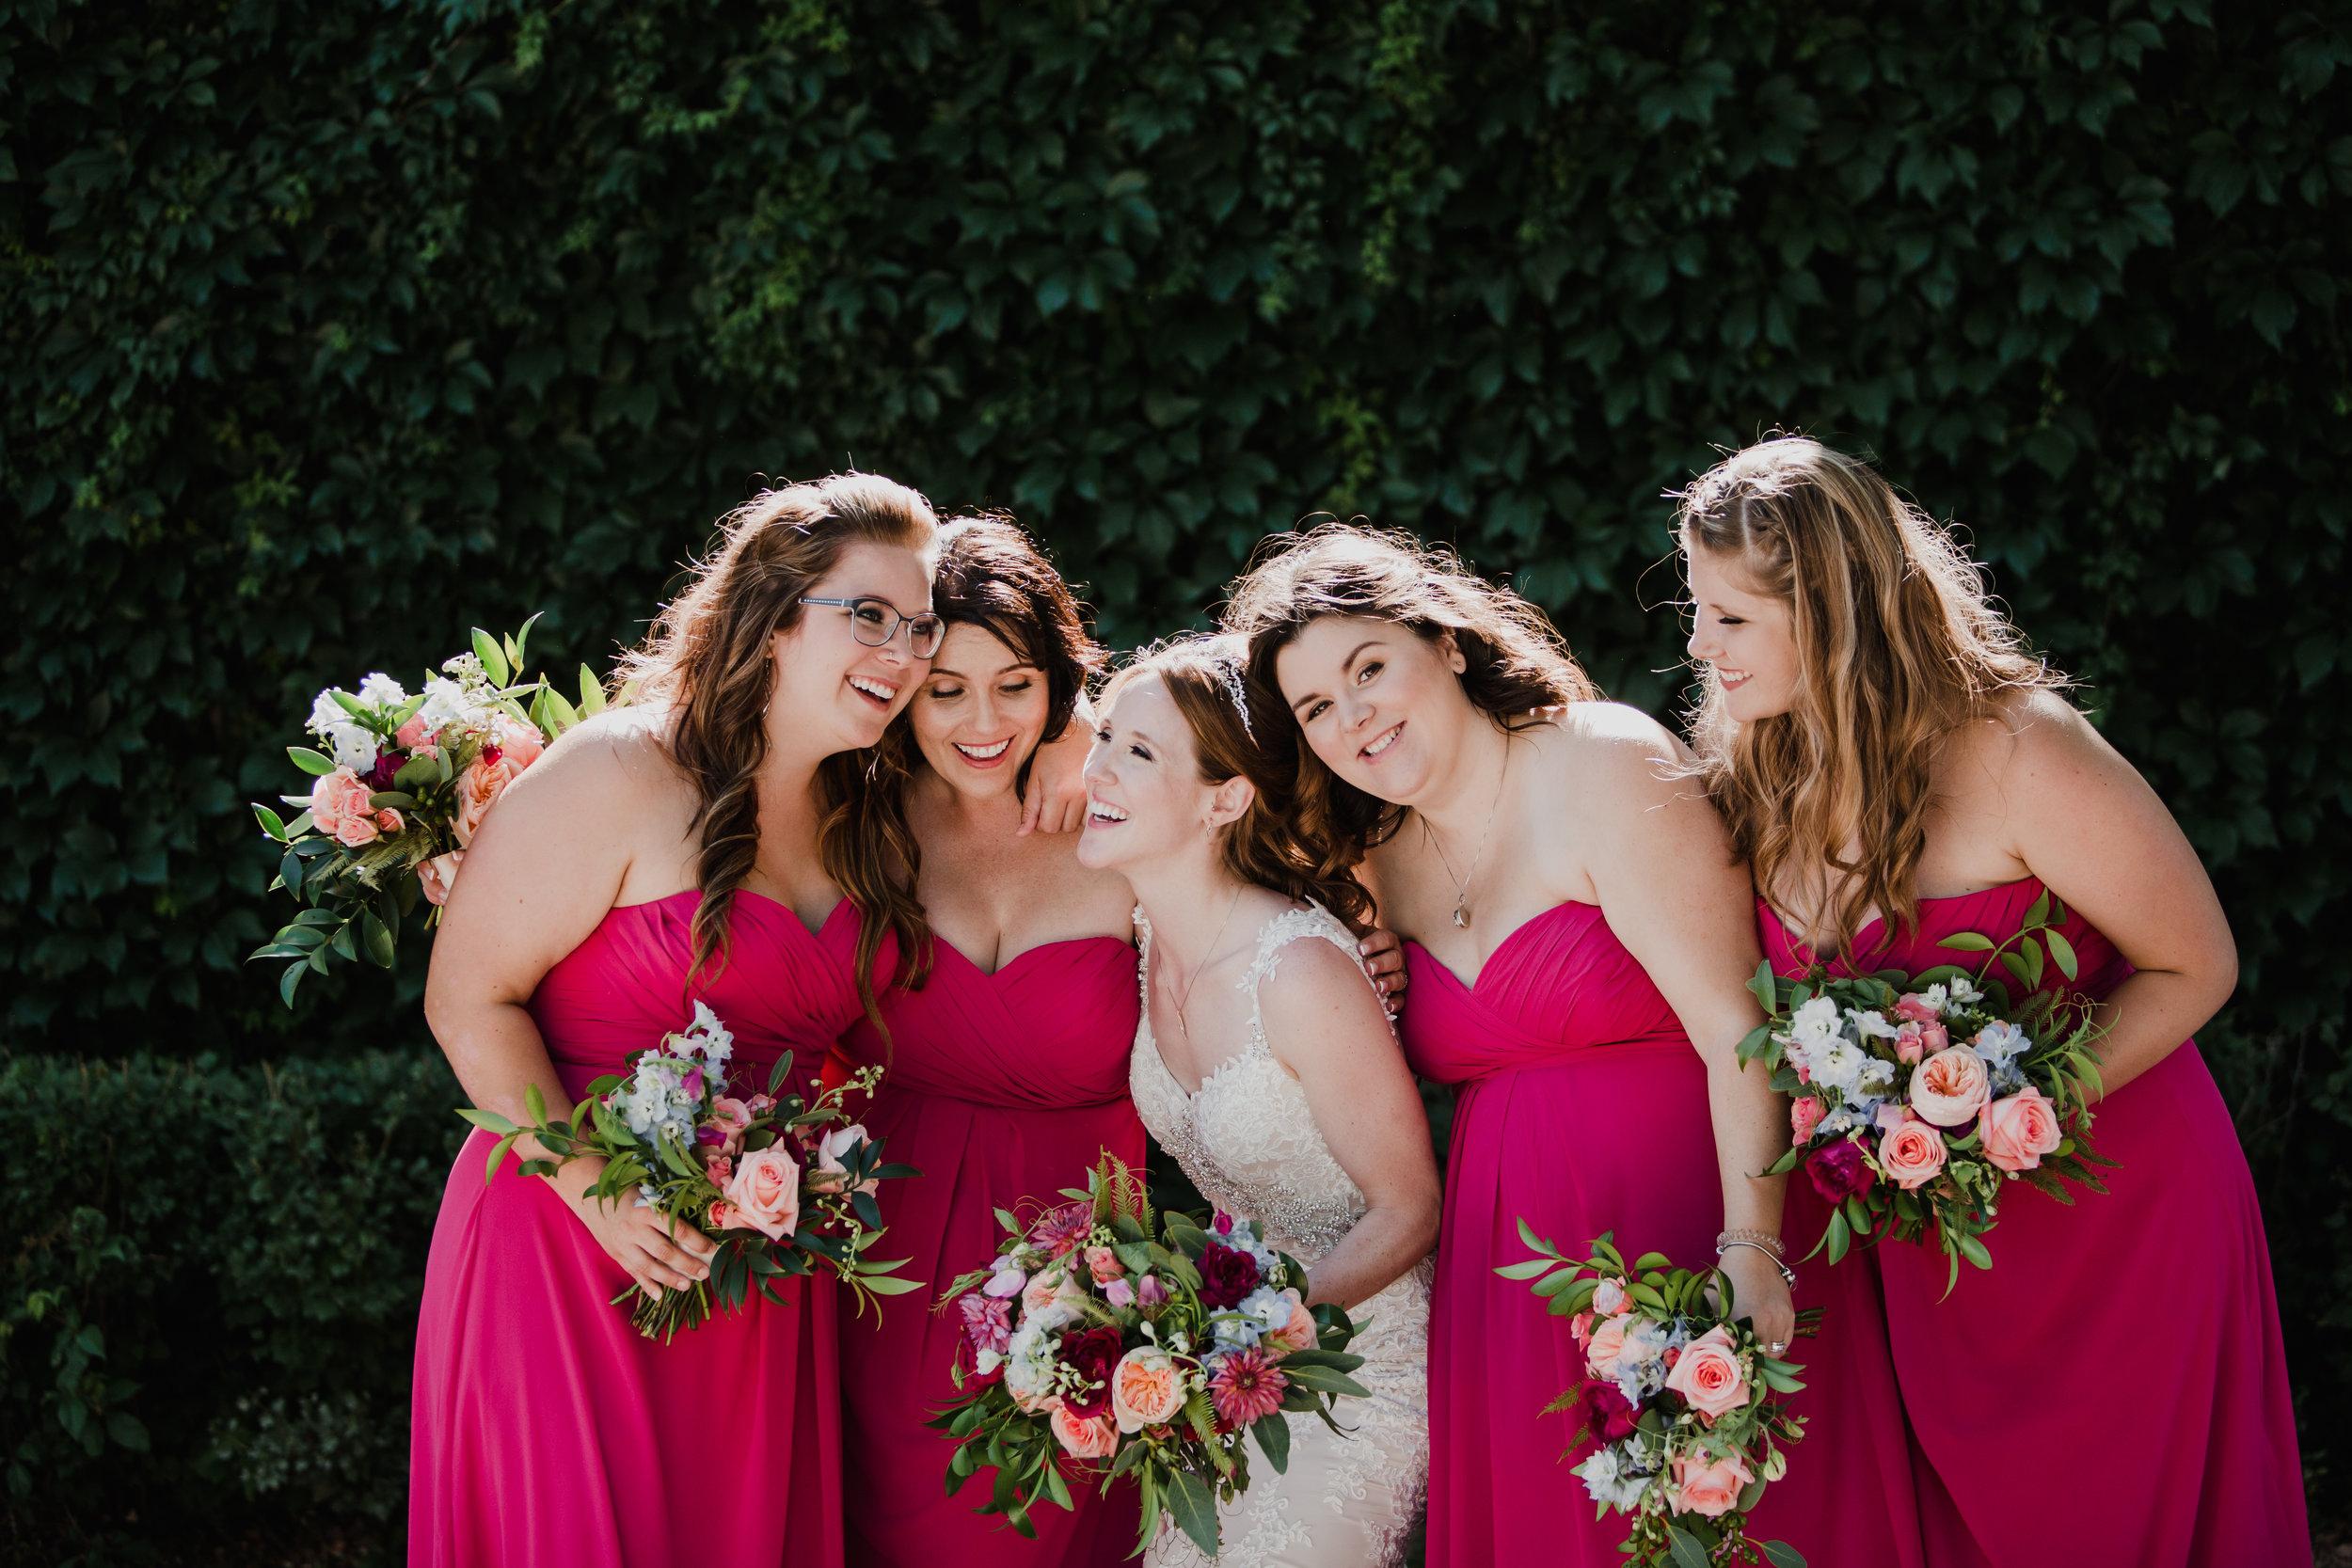 Fuschia Bridesmaid Dresses - Winnipeg wedding Florist